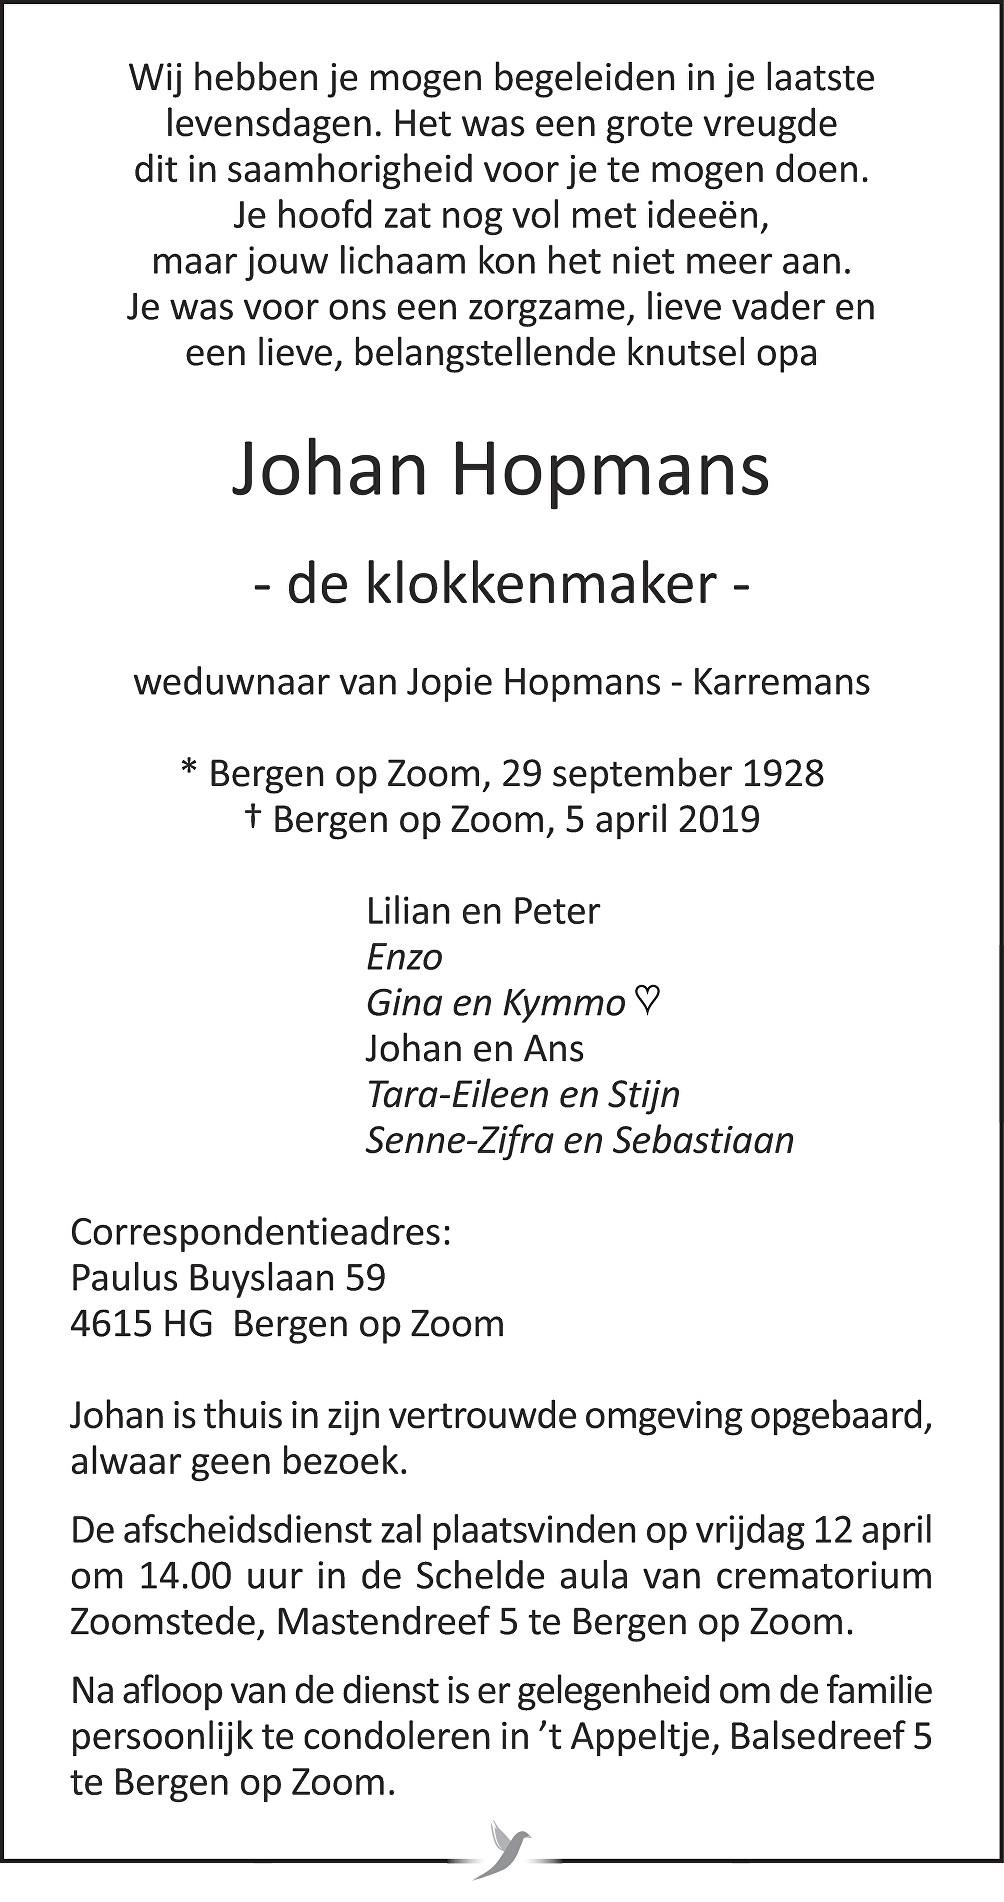 Johan Hopmans Death notice